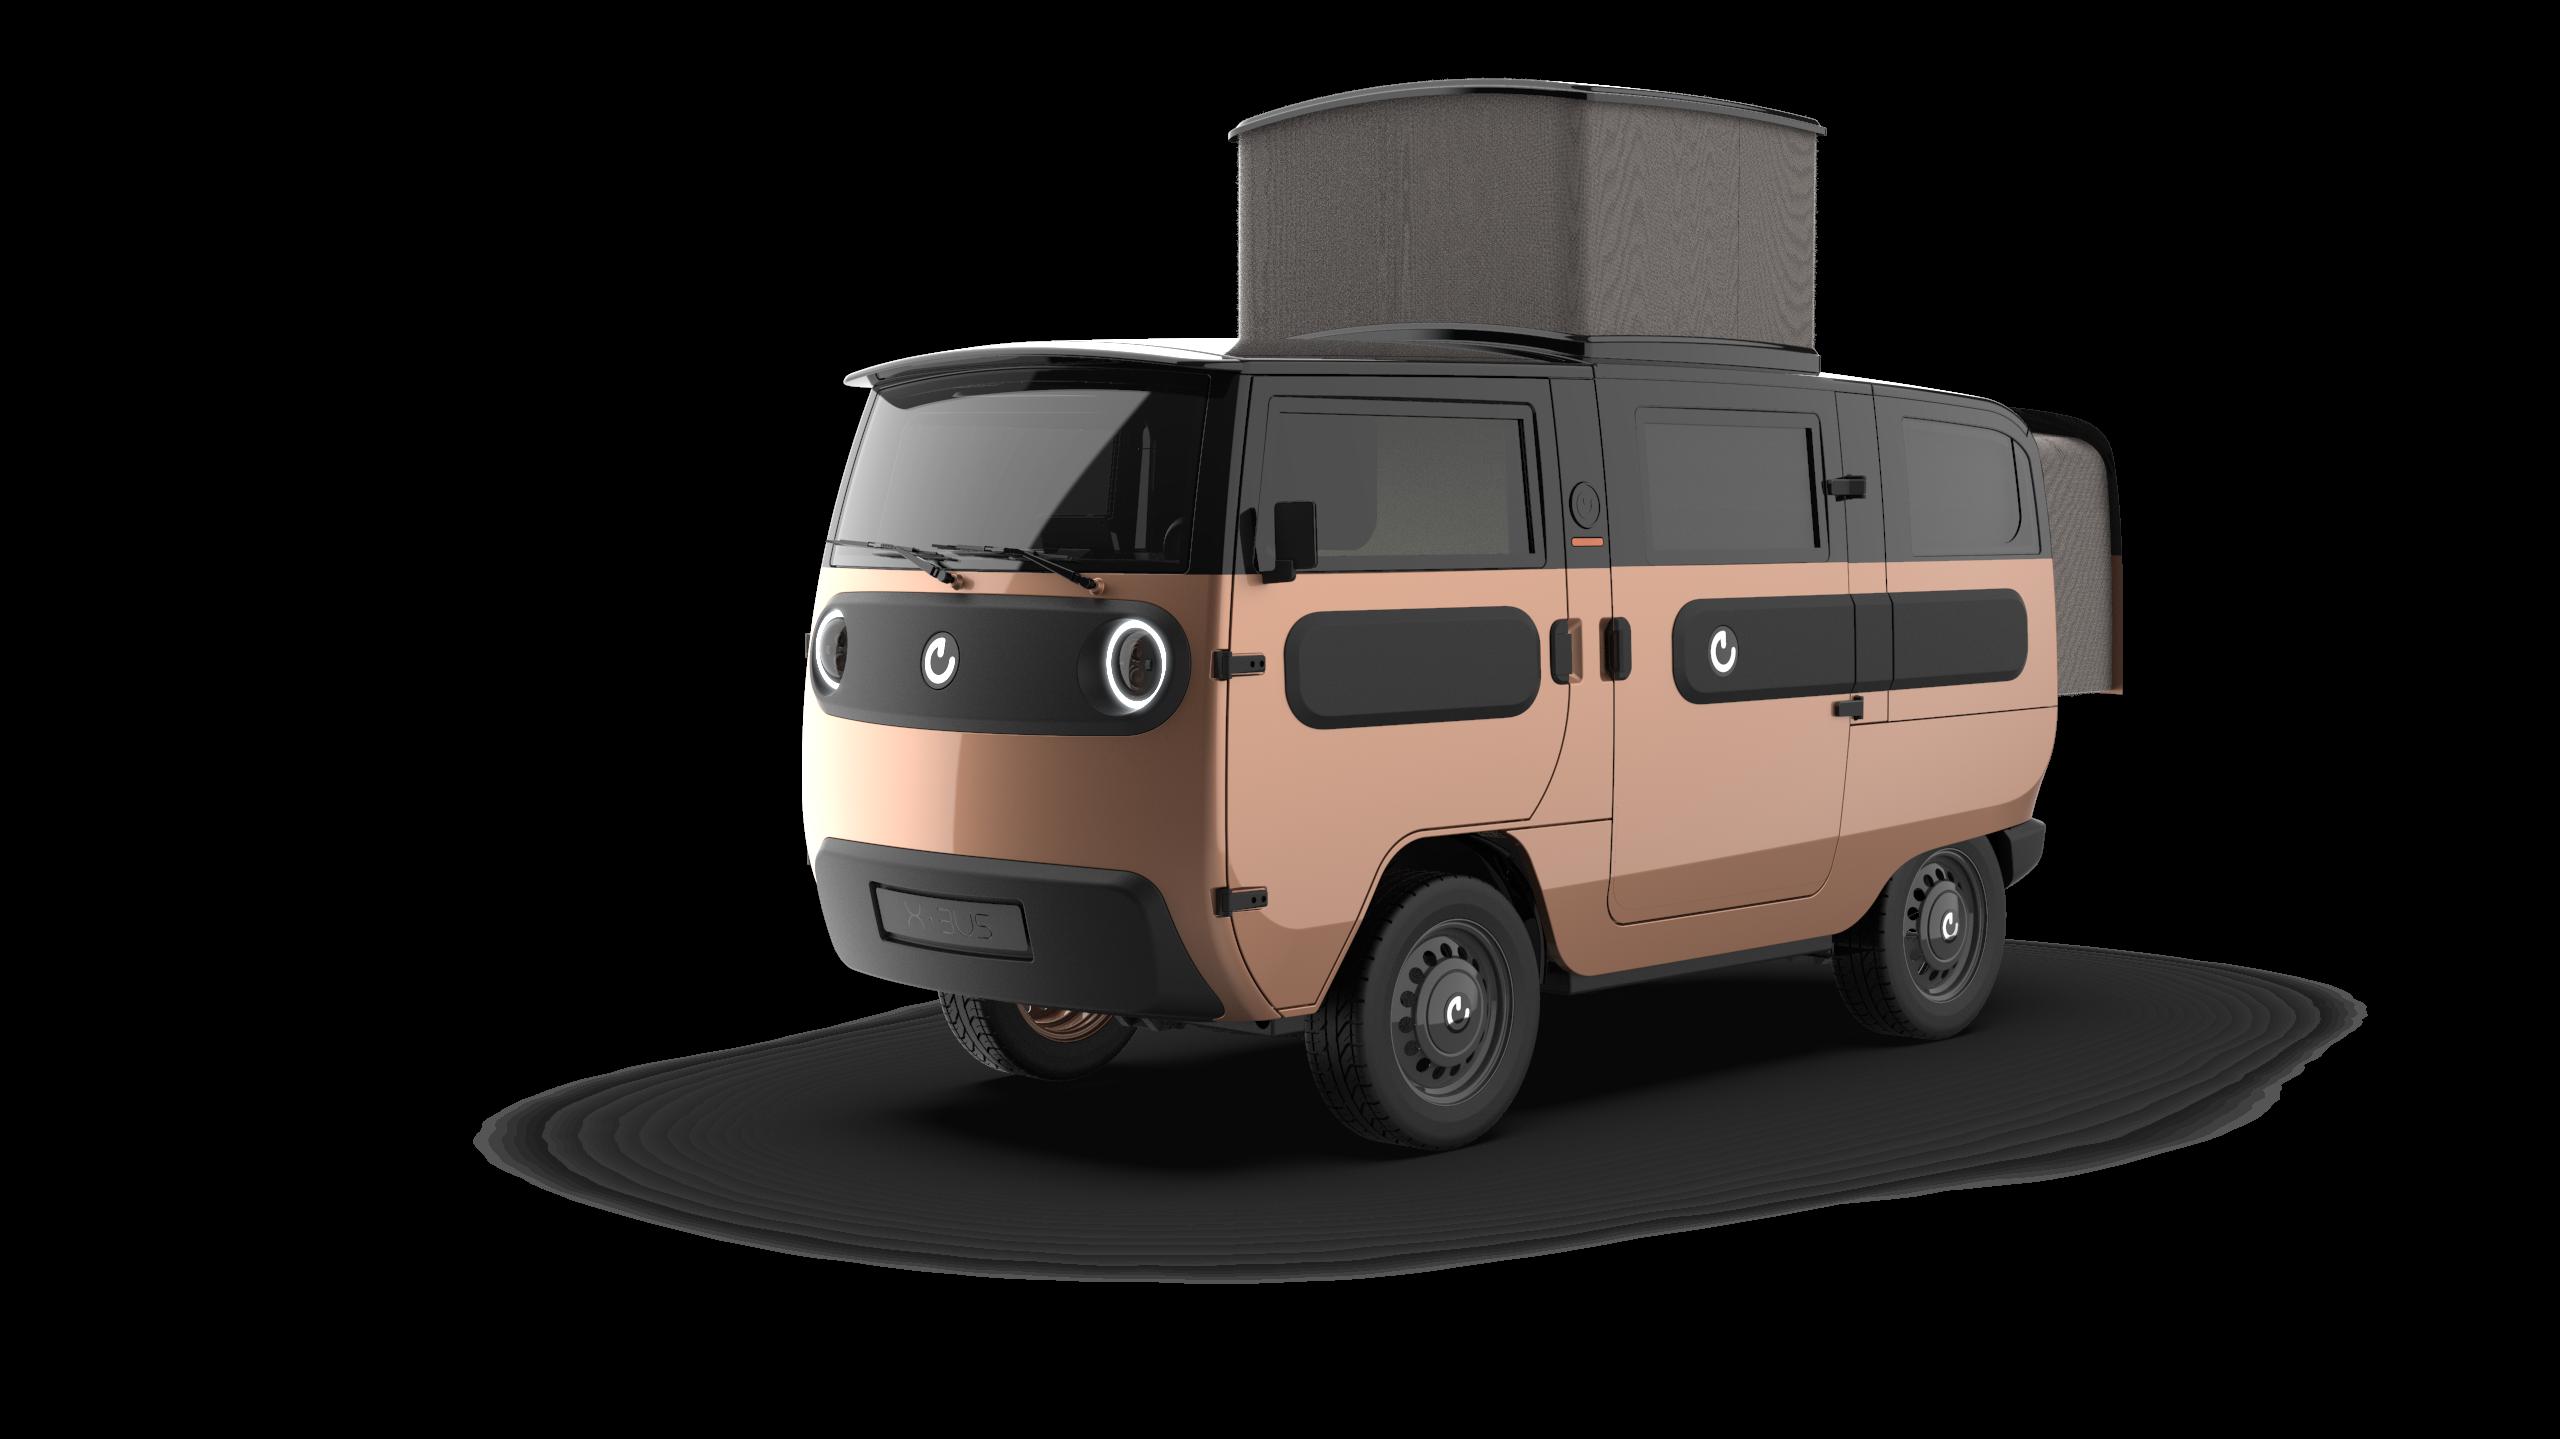 XBUS_Standard_Camper_front